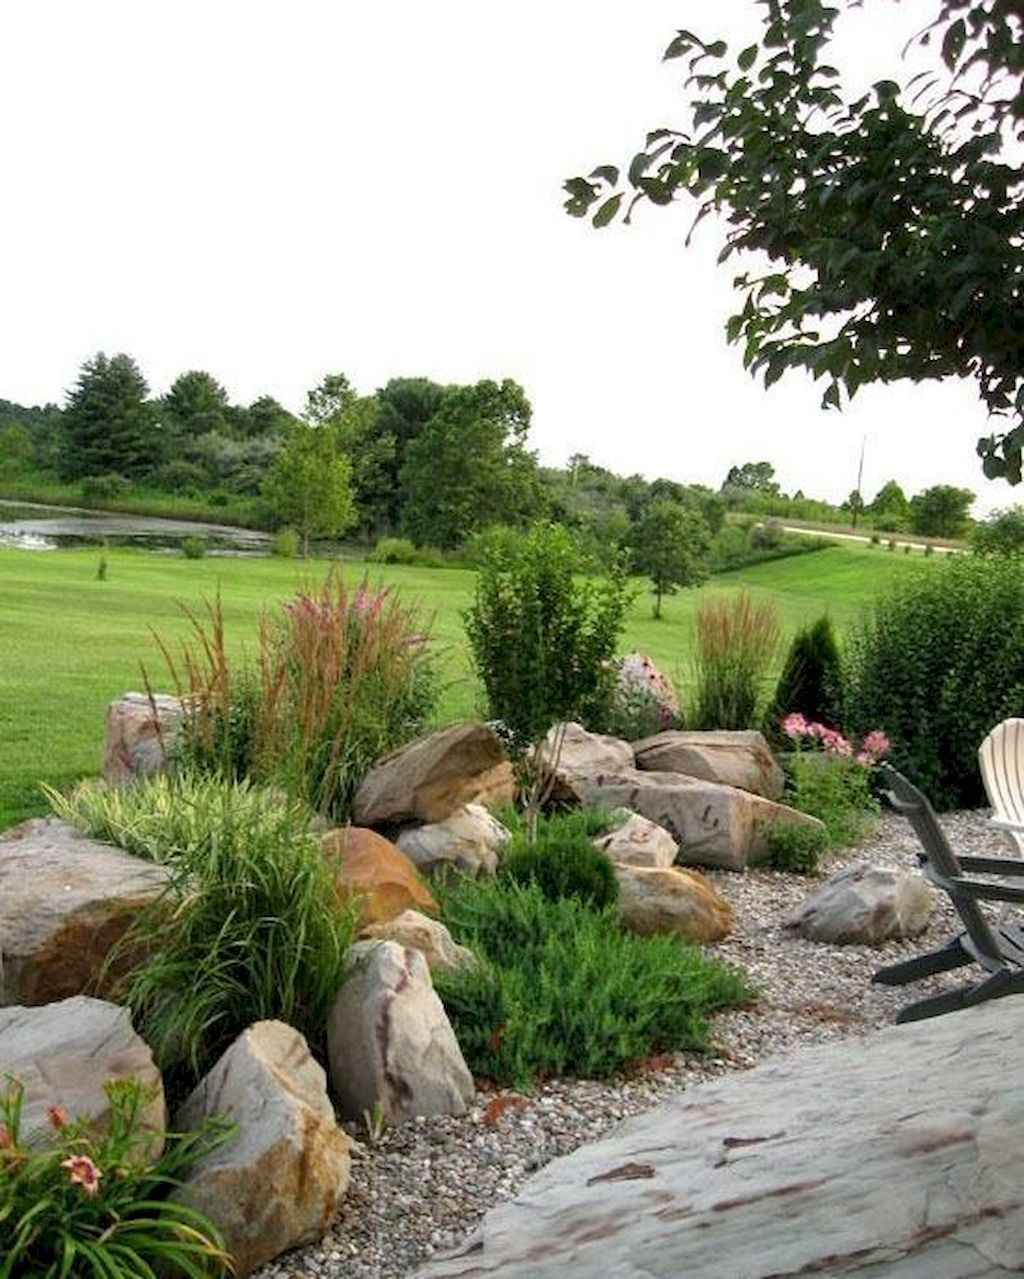 Rock Garden Front Yard Landscaping Ideas: Beautiful Front Yard Rock Garden Landscaping Ideas (29